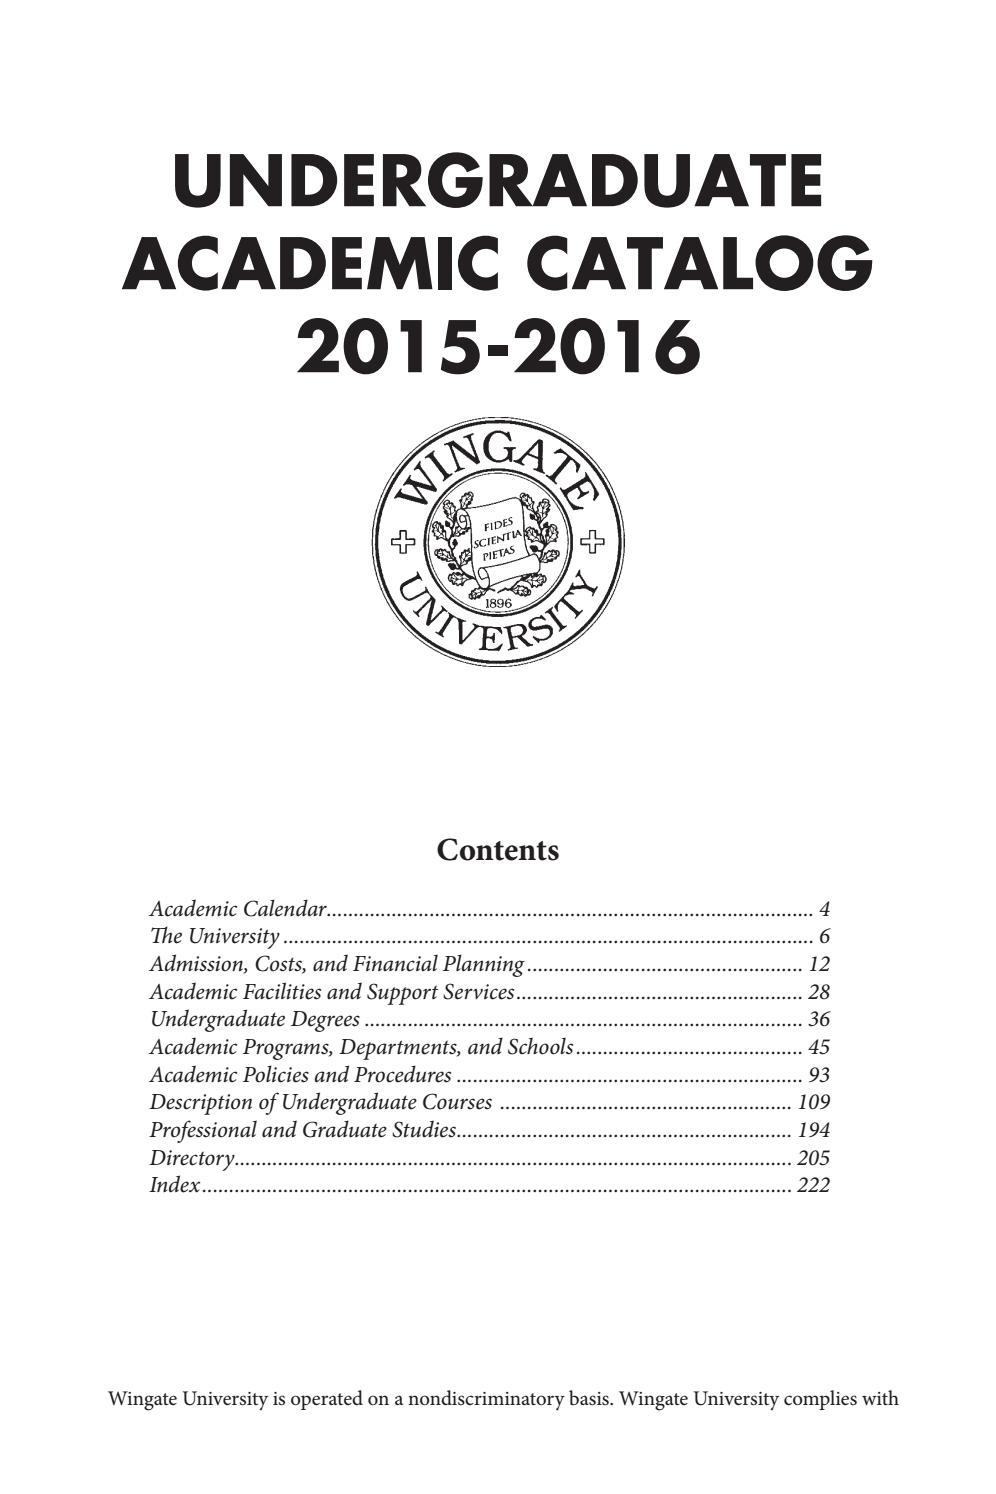 2015 16 Undergraduate Catalogwingate University - Issuu Intended For Delaware University Academic Calendar